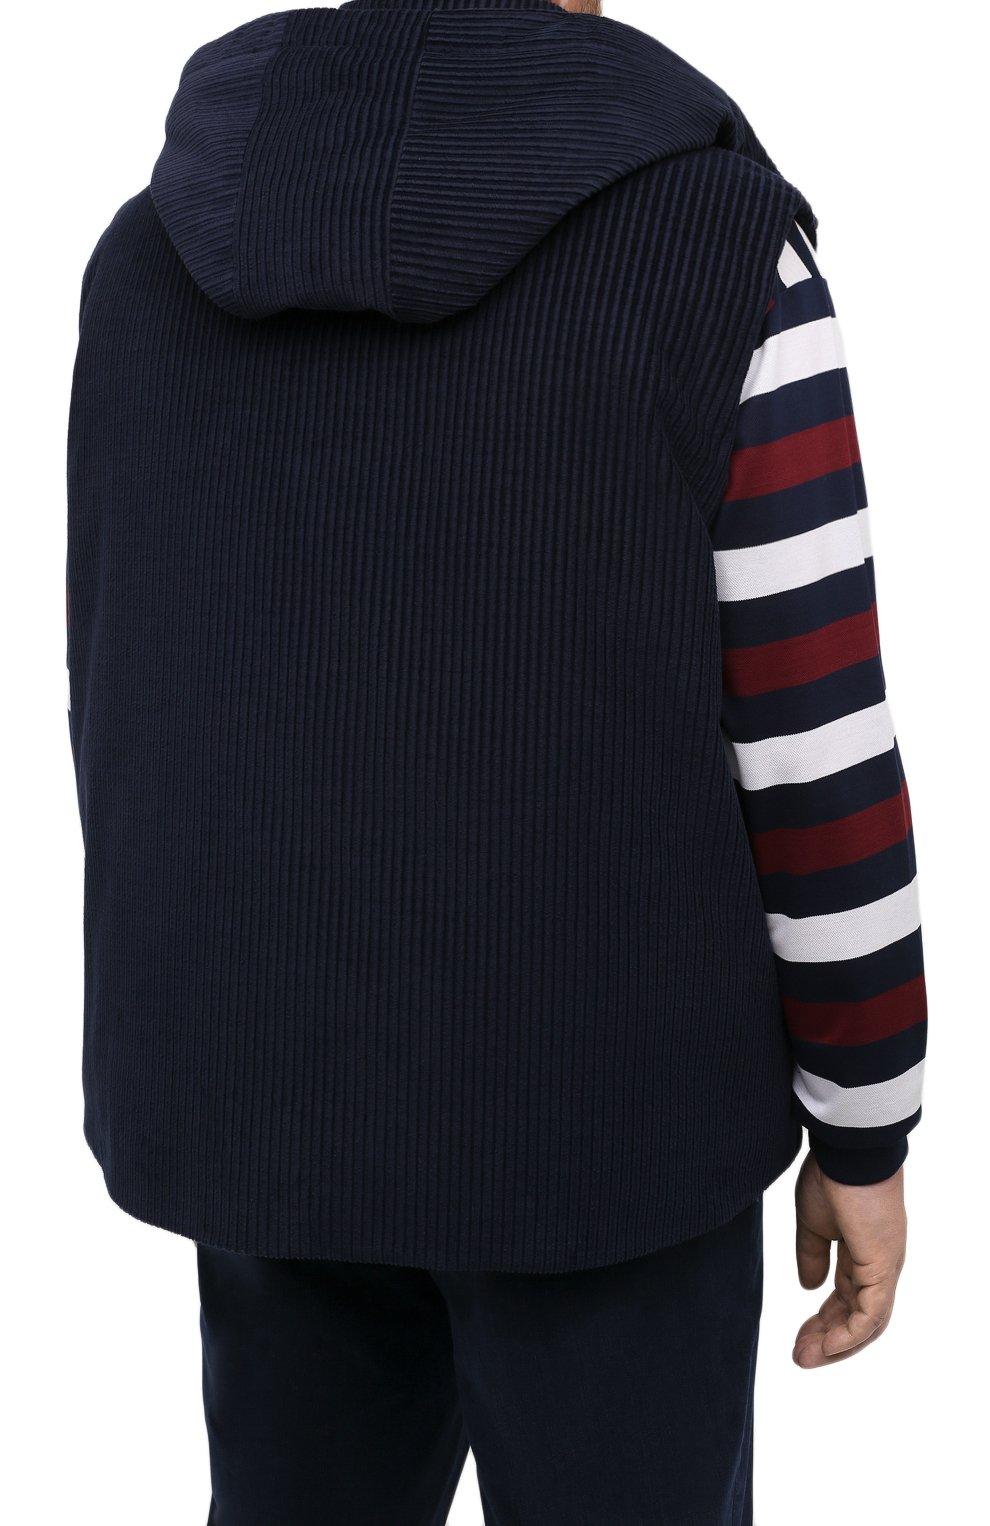 Мужской пуховый жилет KIRED синего цвета, арт. WBEARW7204001000/62-72 | Фото 4